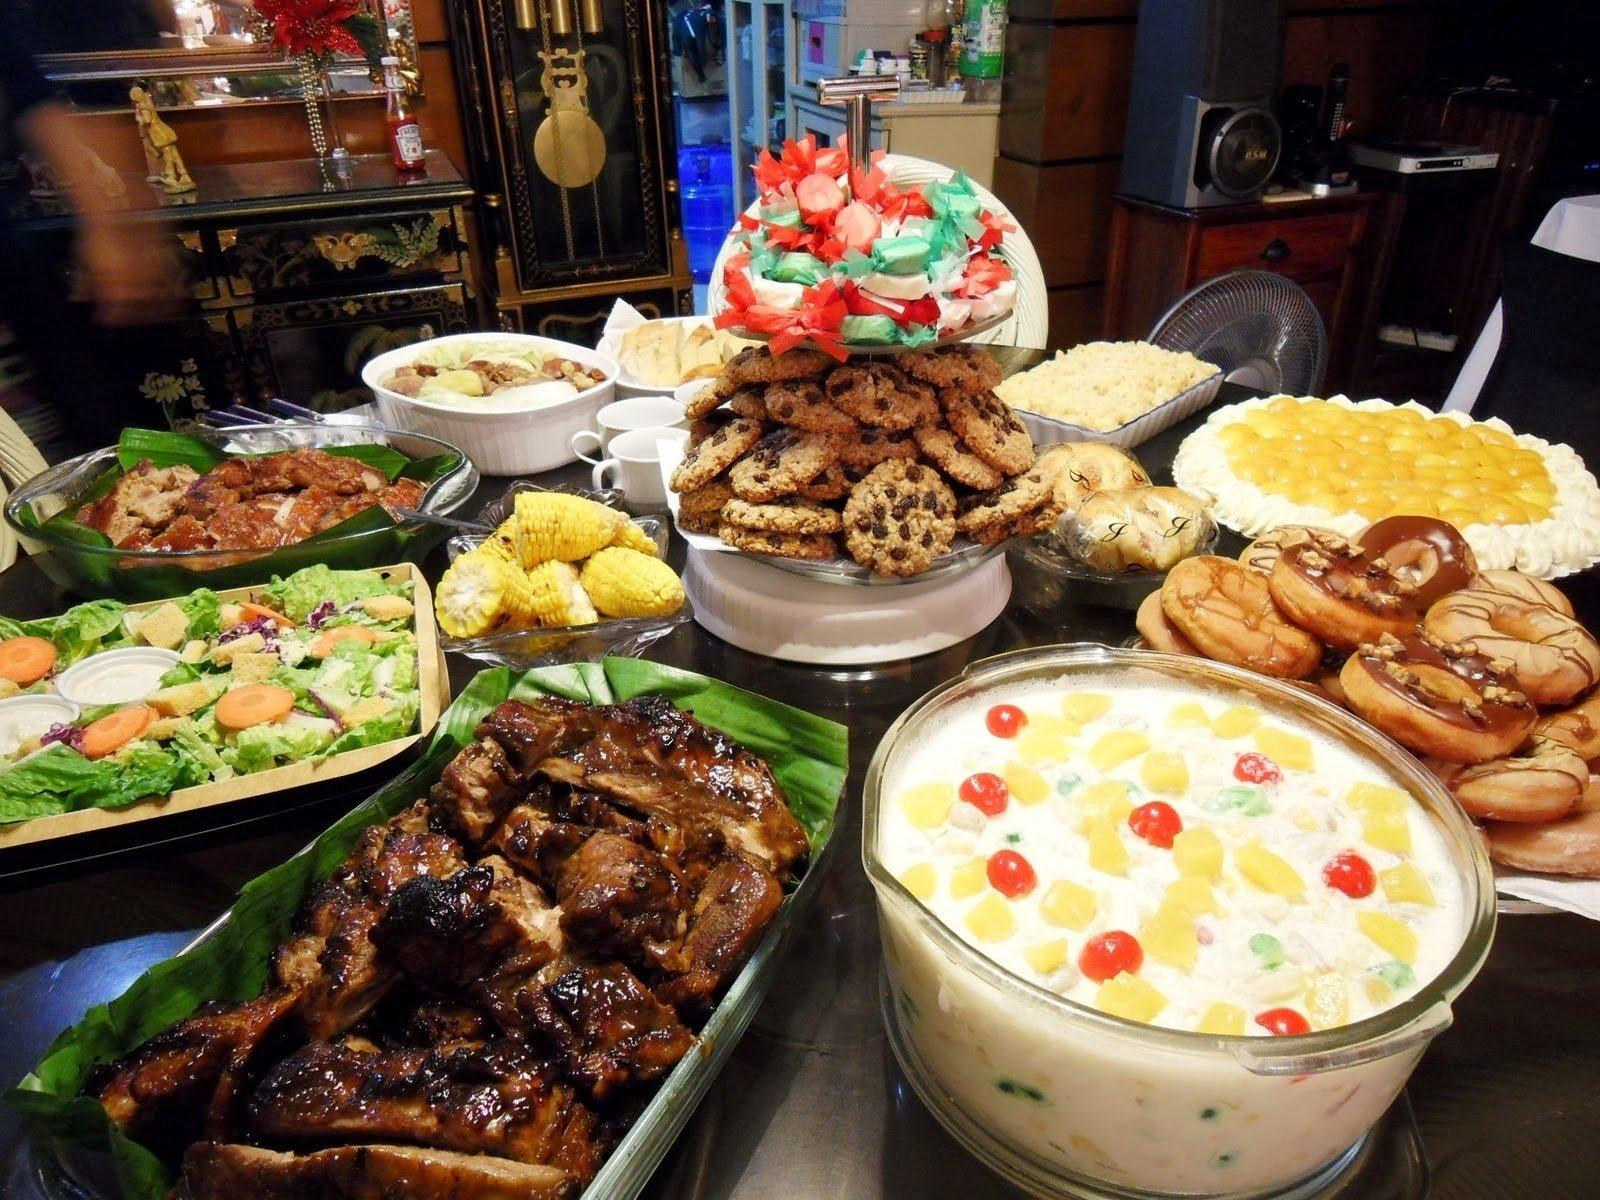 10 Stylish New Years Eve Dinner Ideas filipino media noche recipes on new years eve barako newsline 3